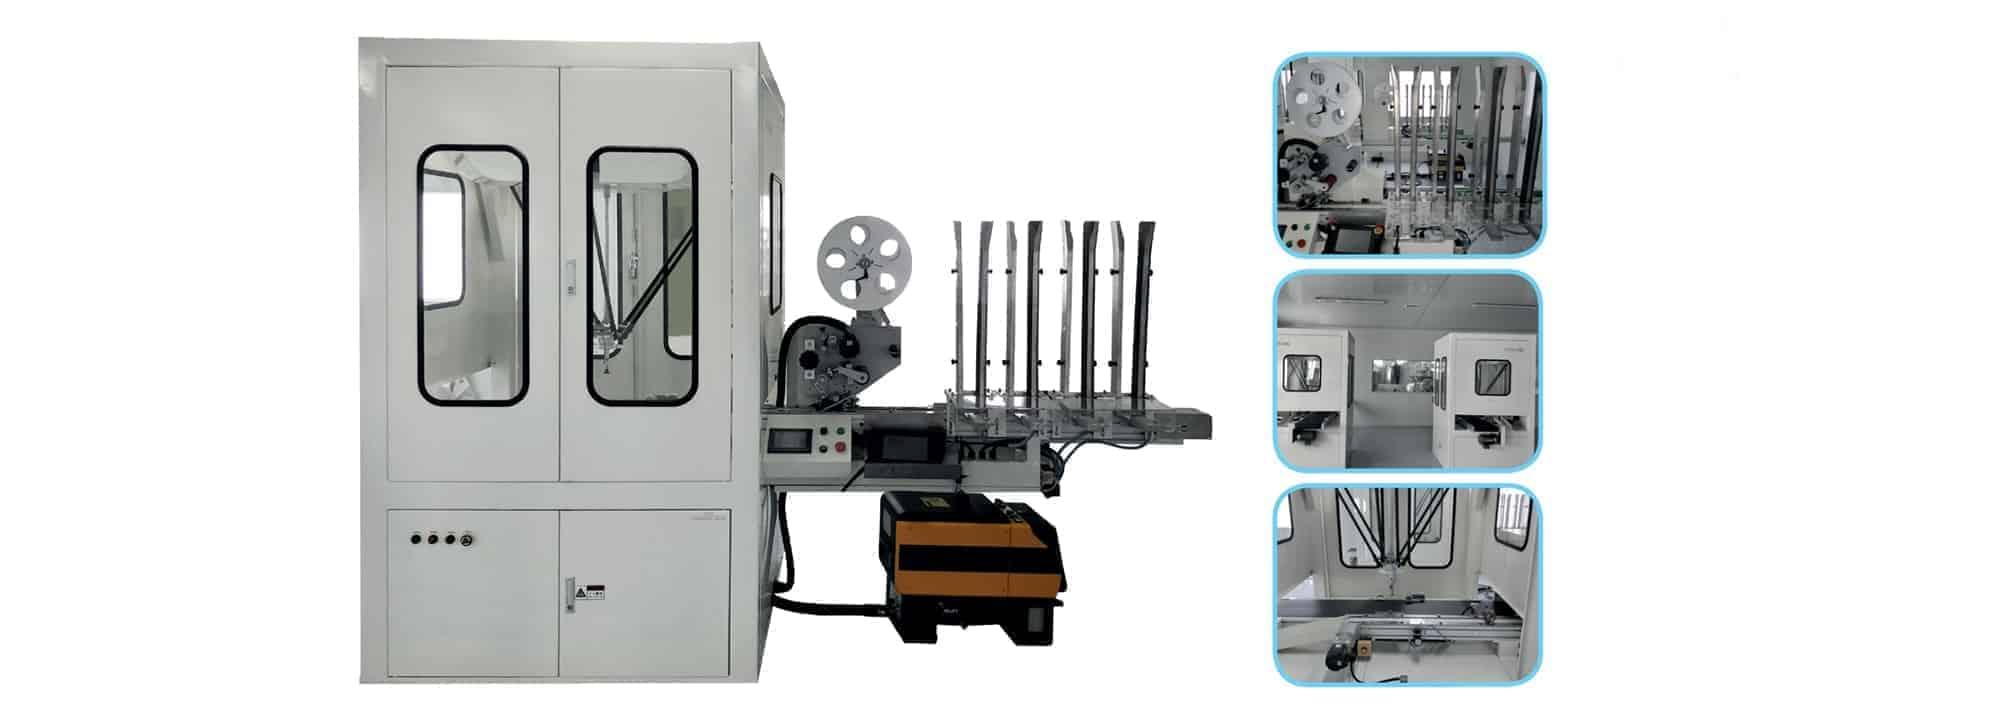 DH L300 1 - DH-L300 Automatic Lid applicator